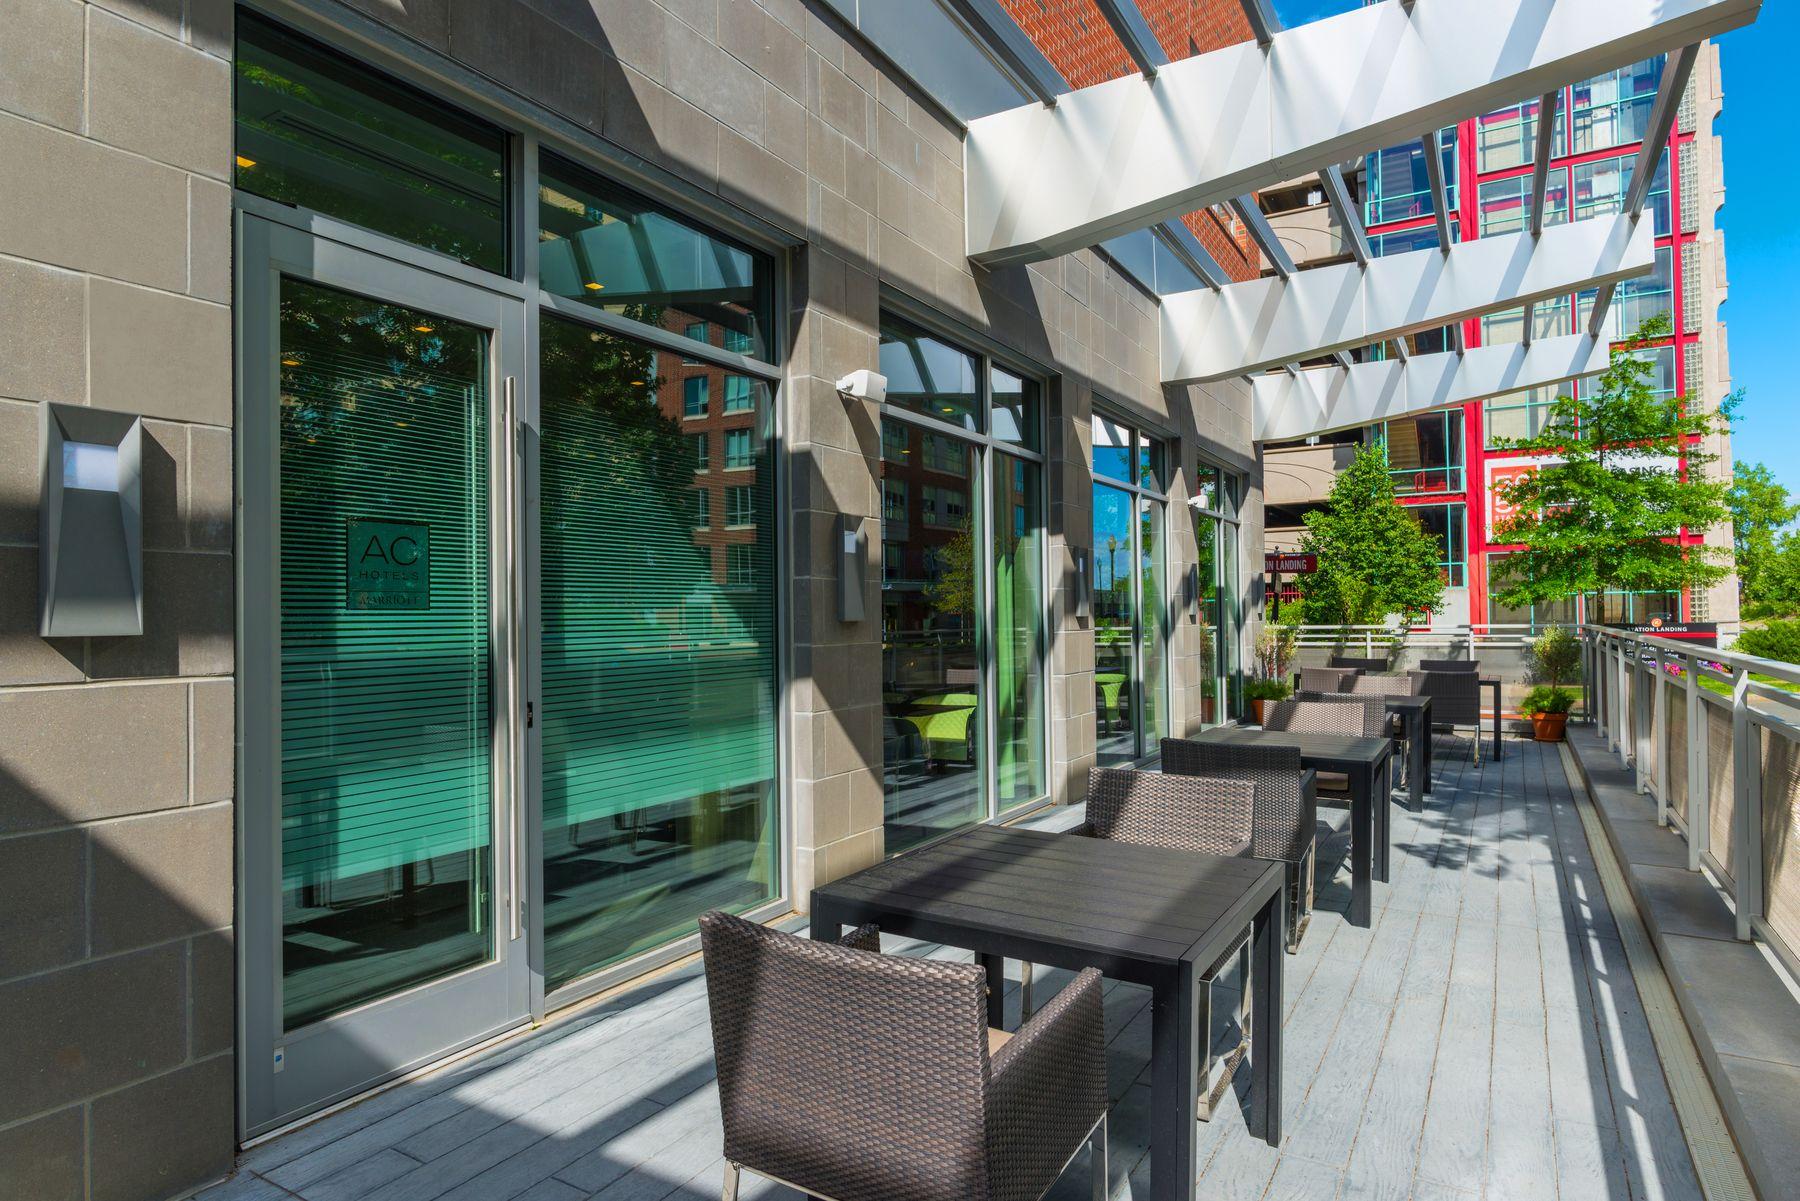 Restaurant patio seating